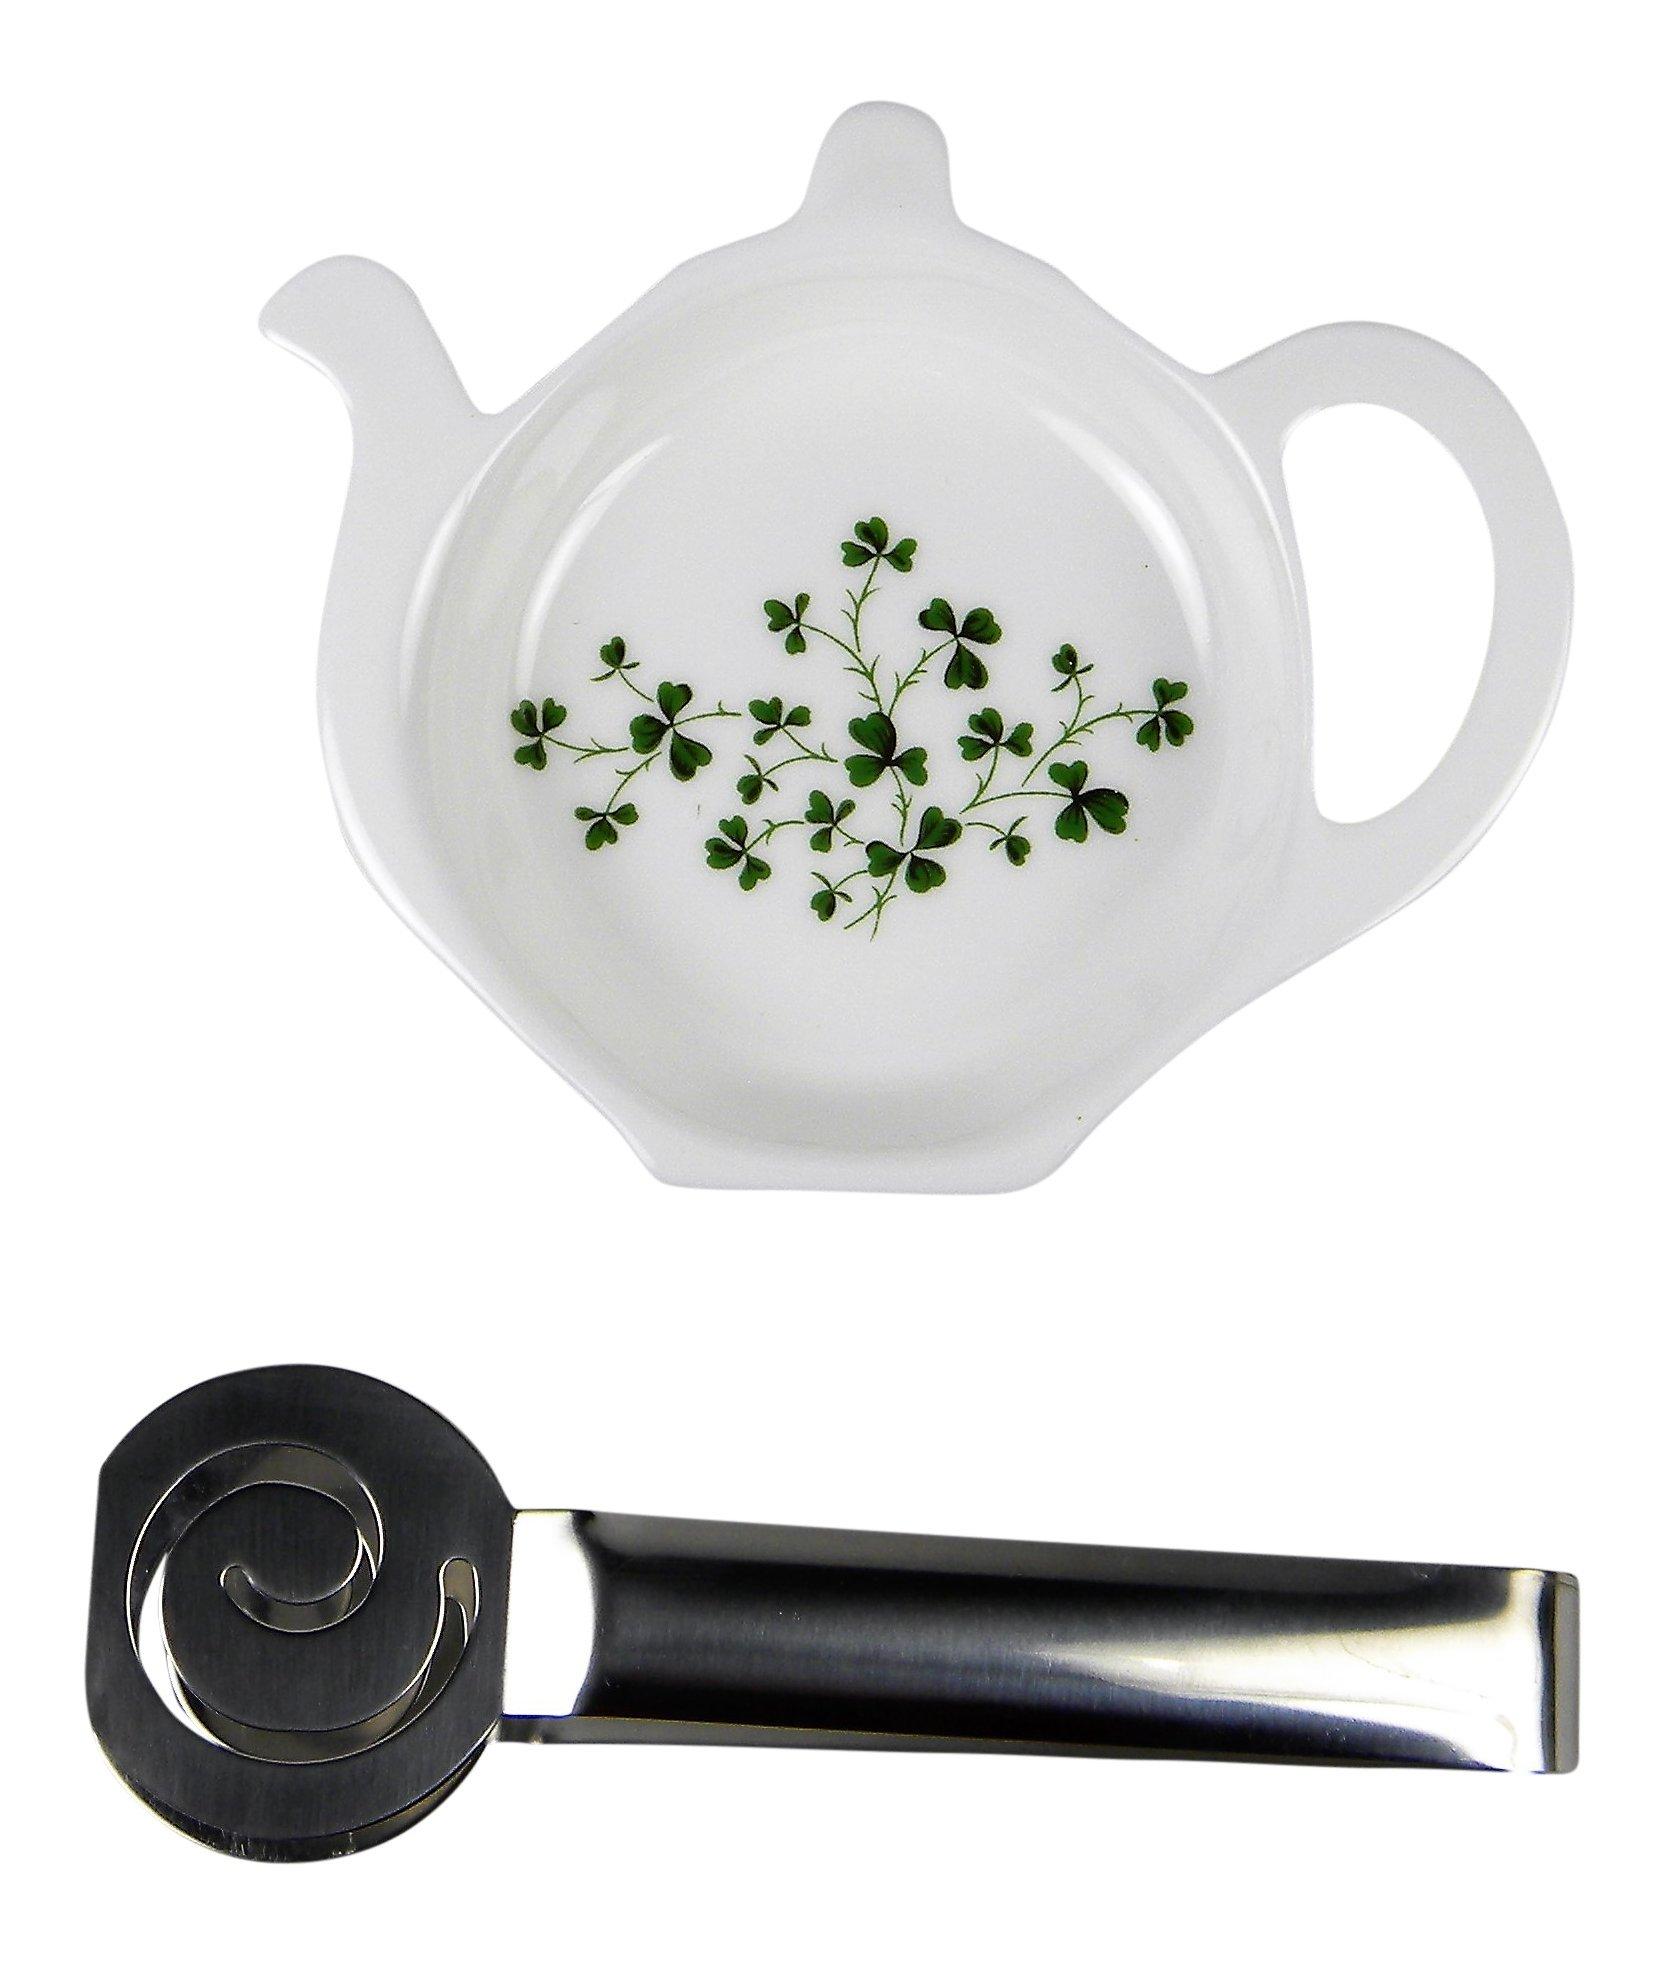 Adderley Bone China Tea Bag Coaster Caddy and Stainless Steel Tea Bag Squeezer England - Shamrocks